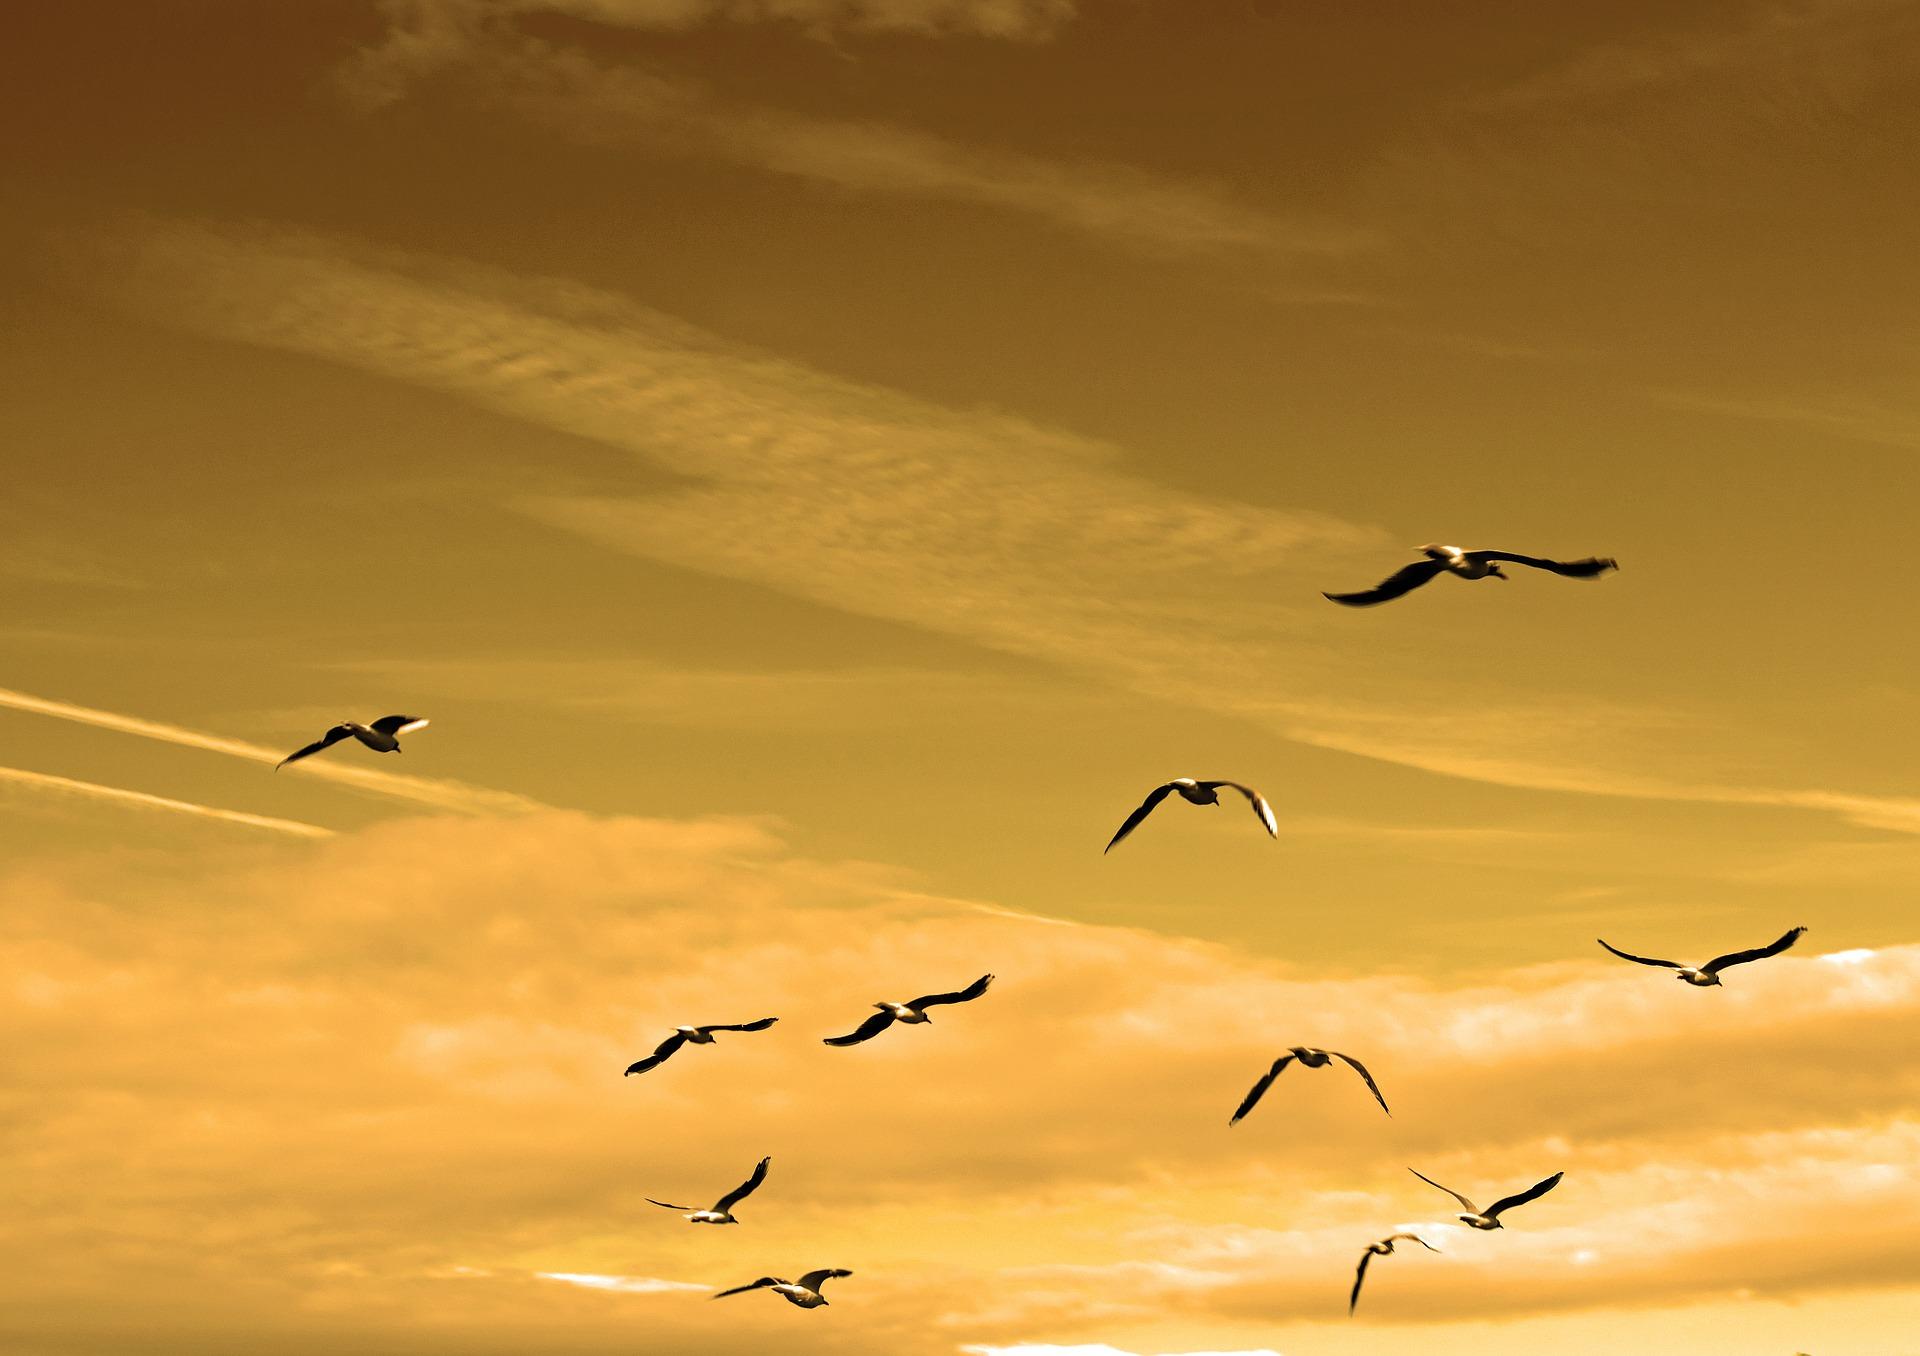 Himmel mit Vögeln